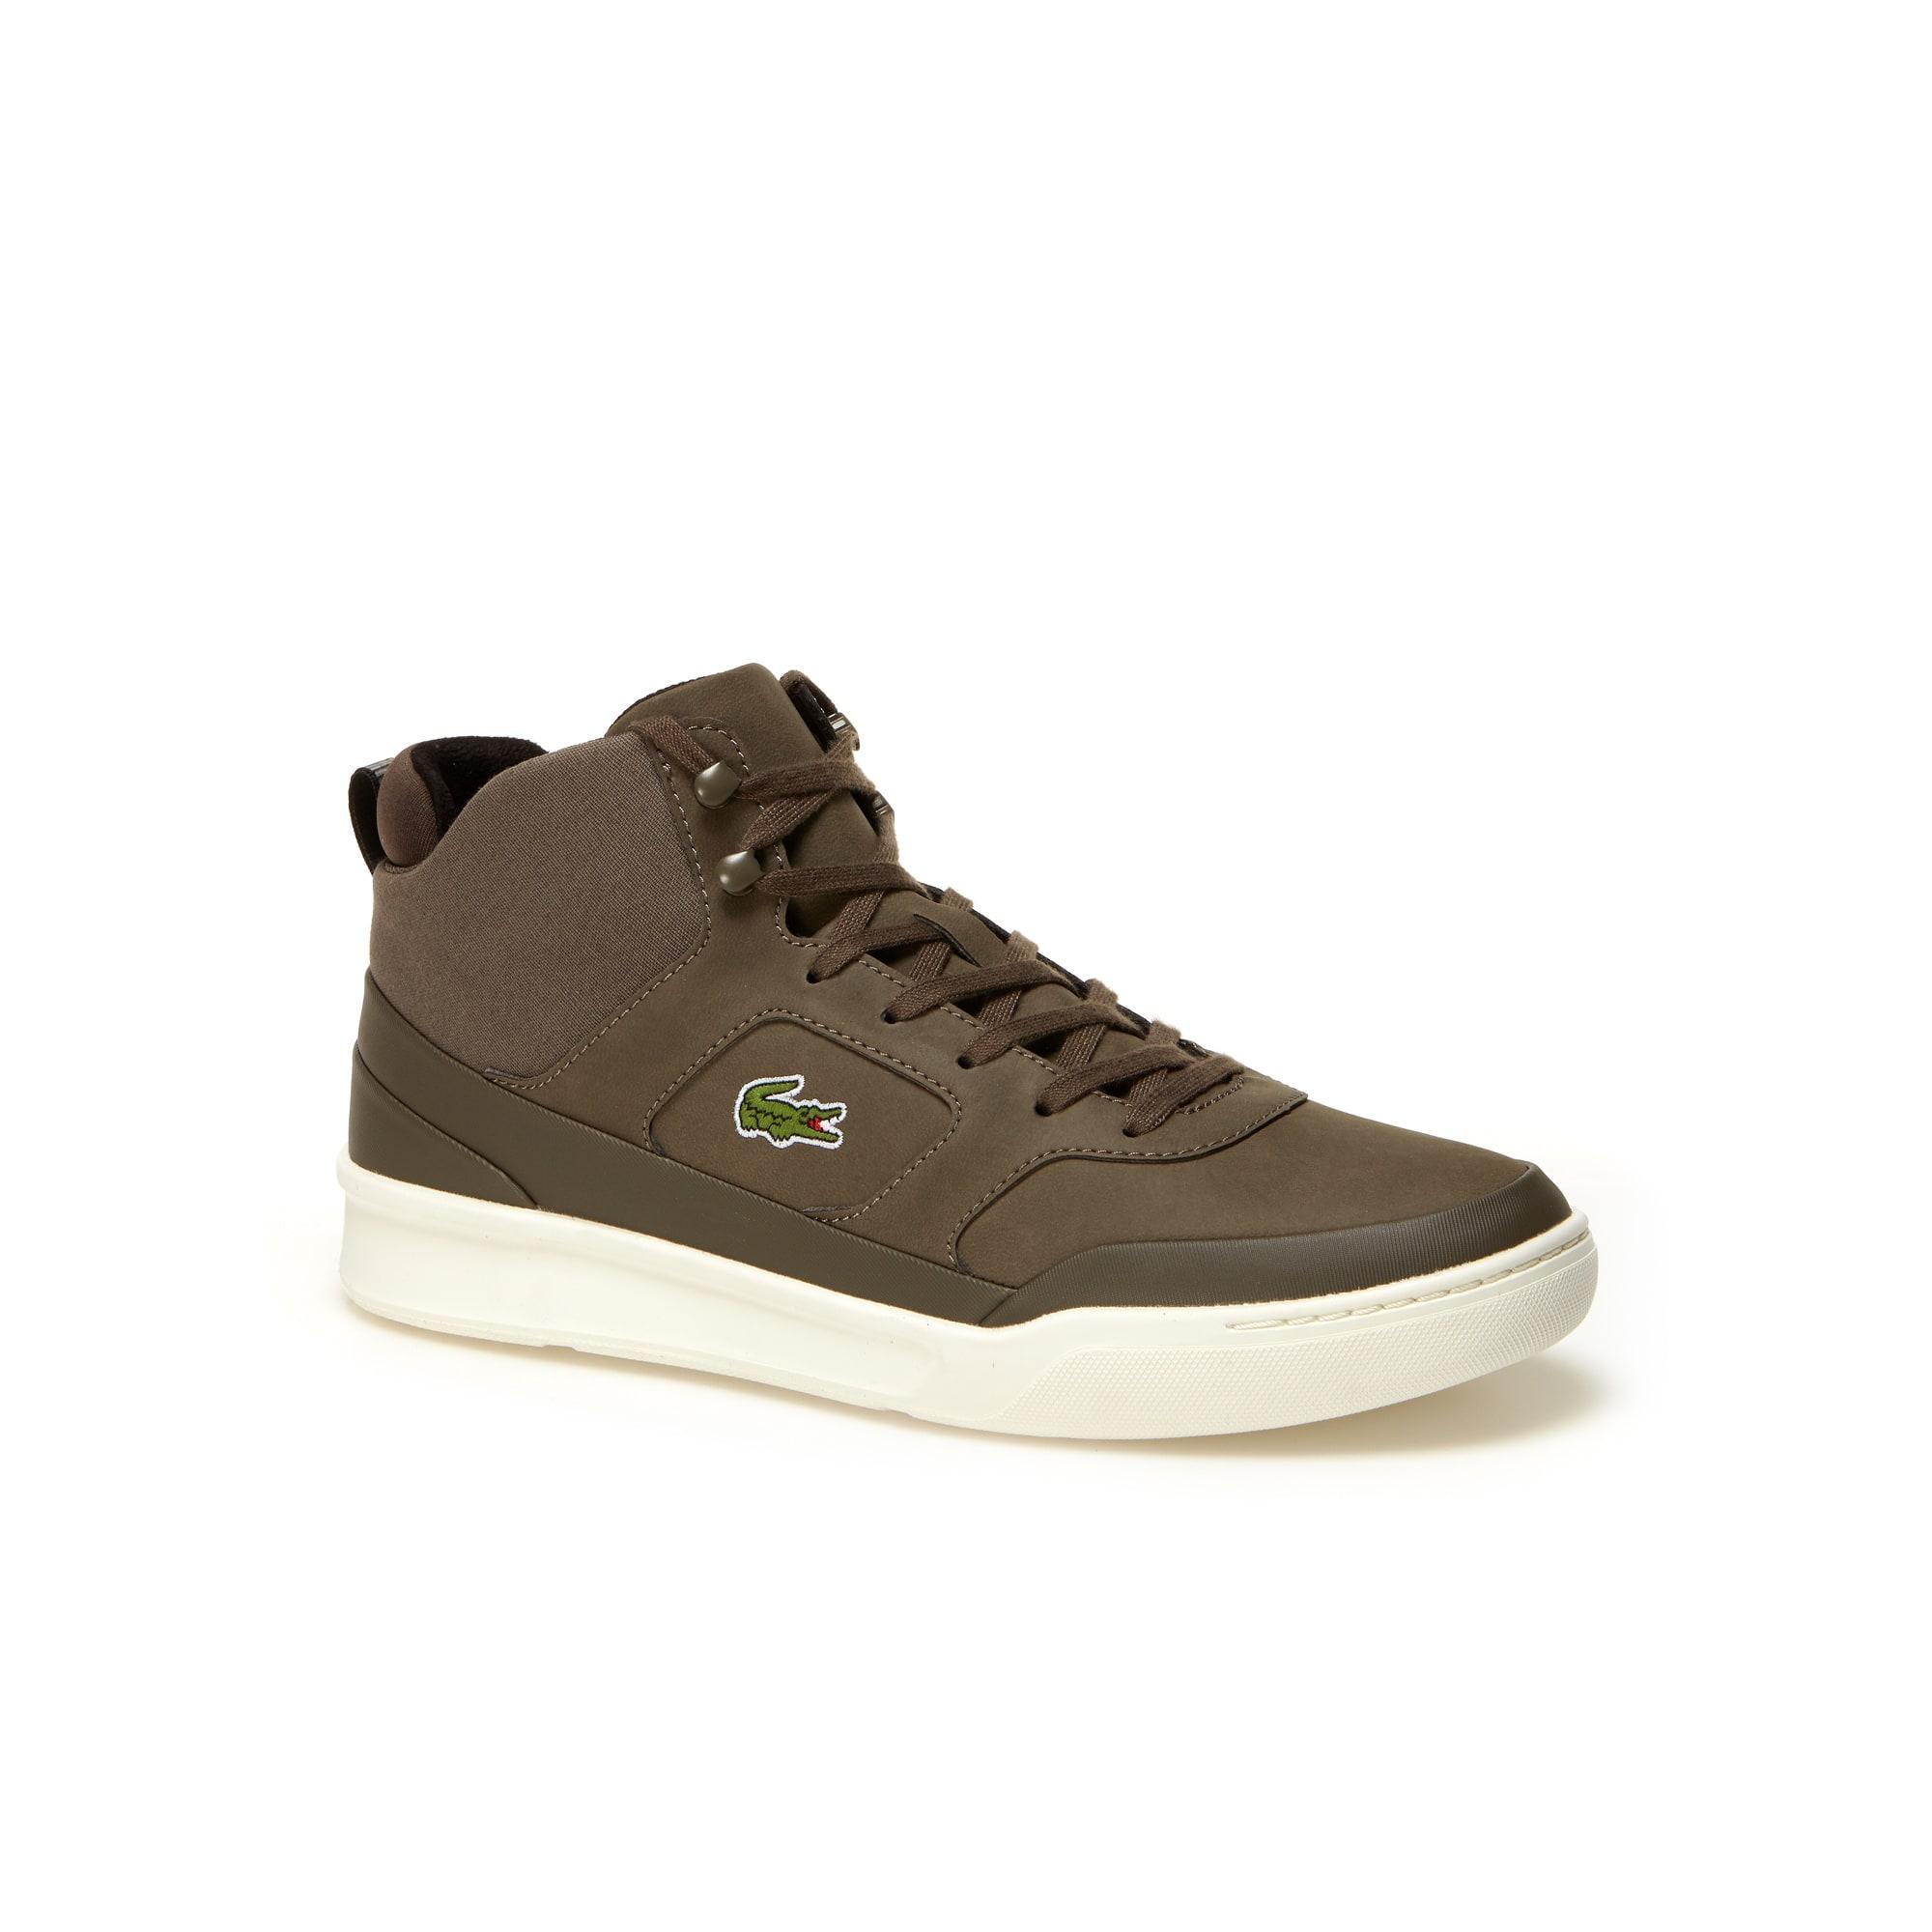 Men's Explorateur Sport Mid Leather Sneakers